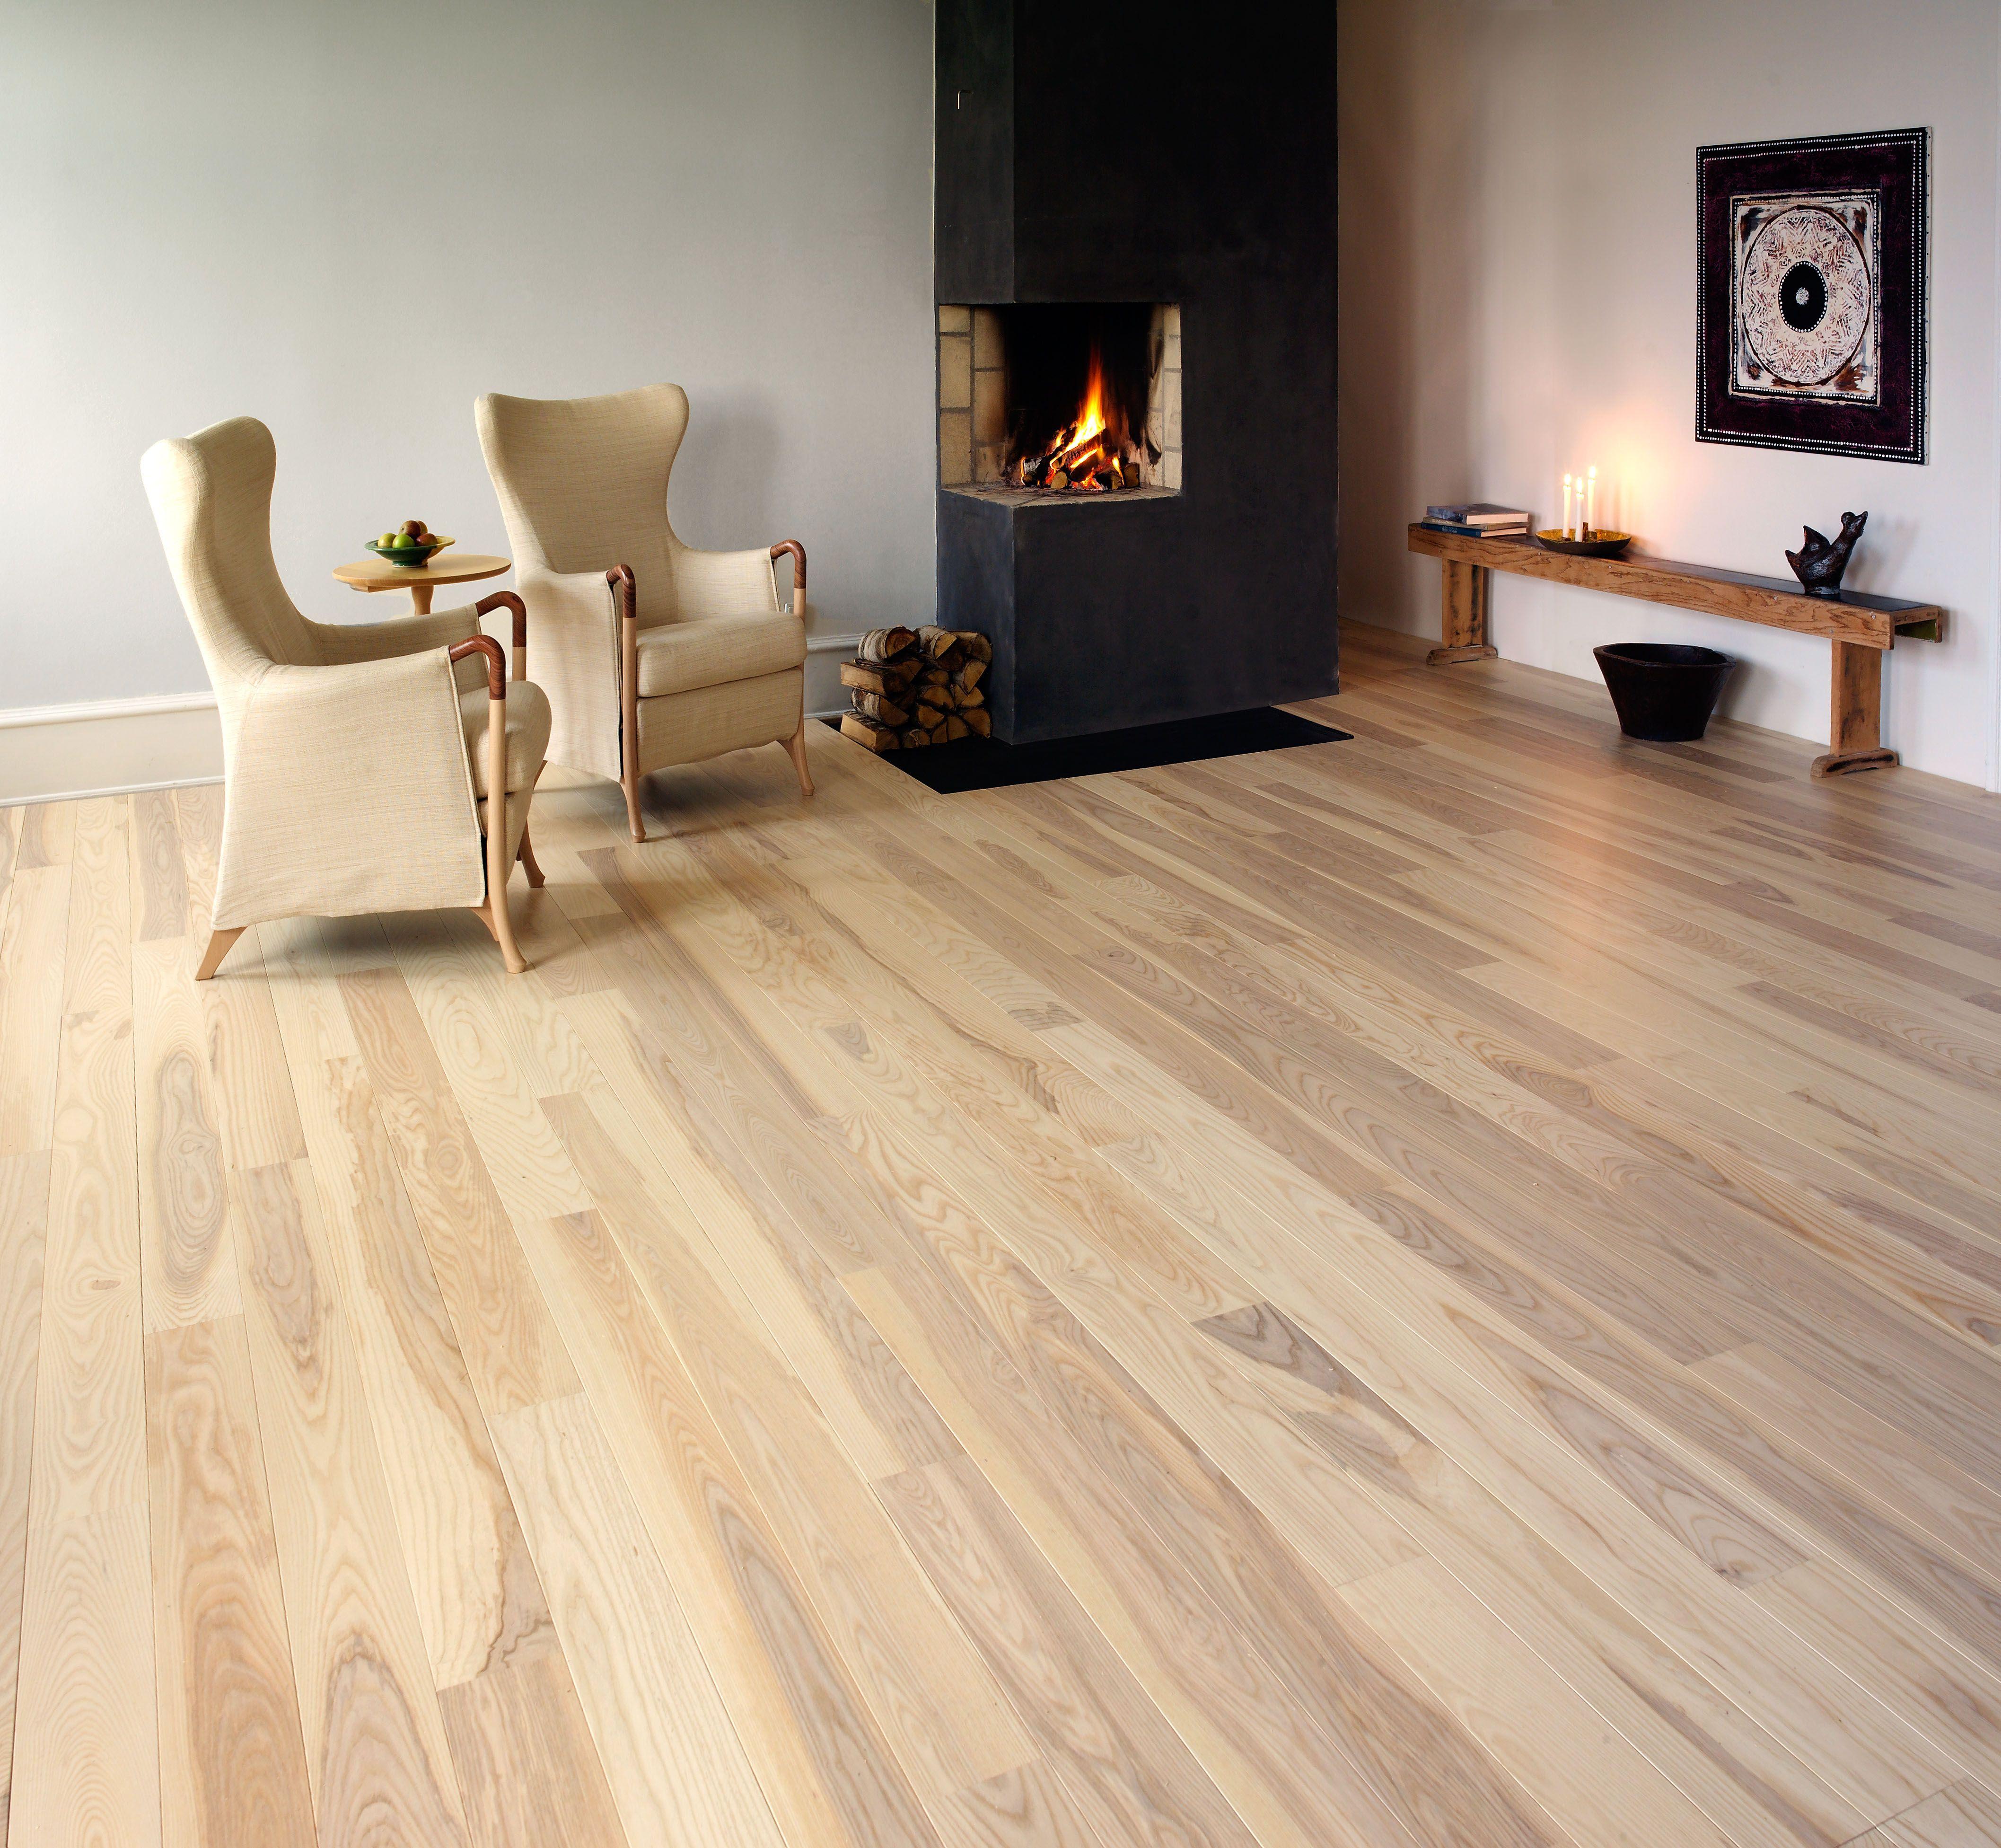 This Junckers' solid wood flooring in light natural tones